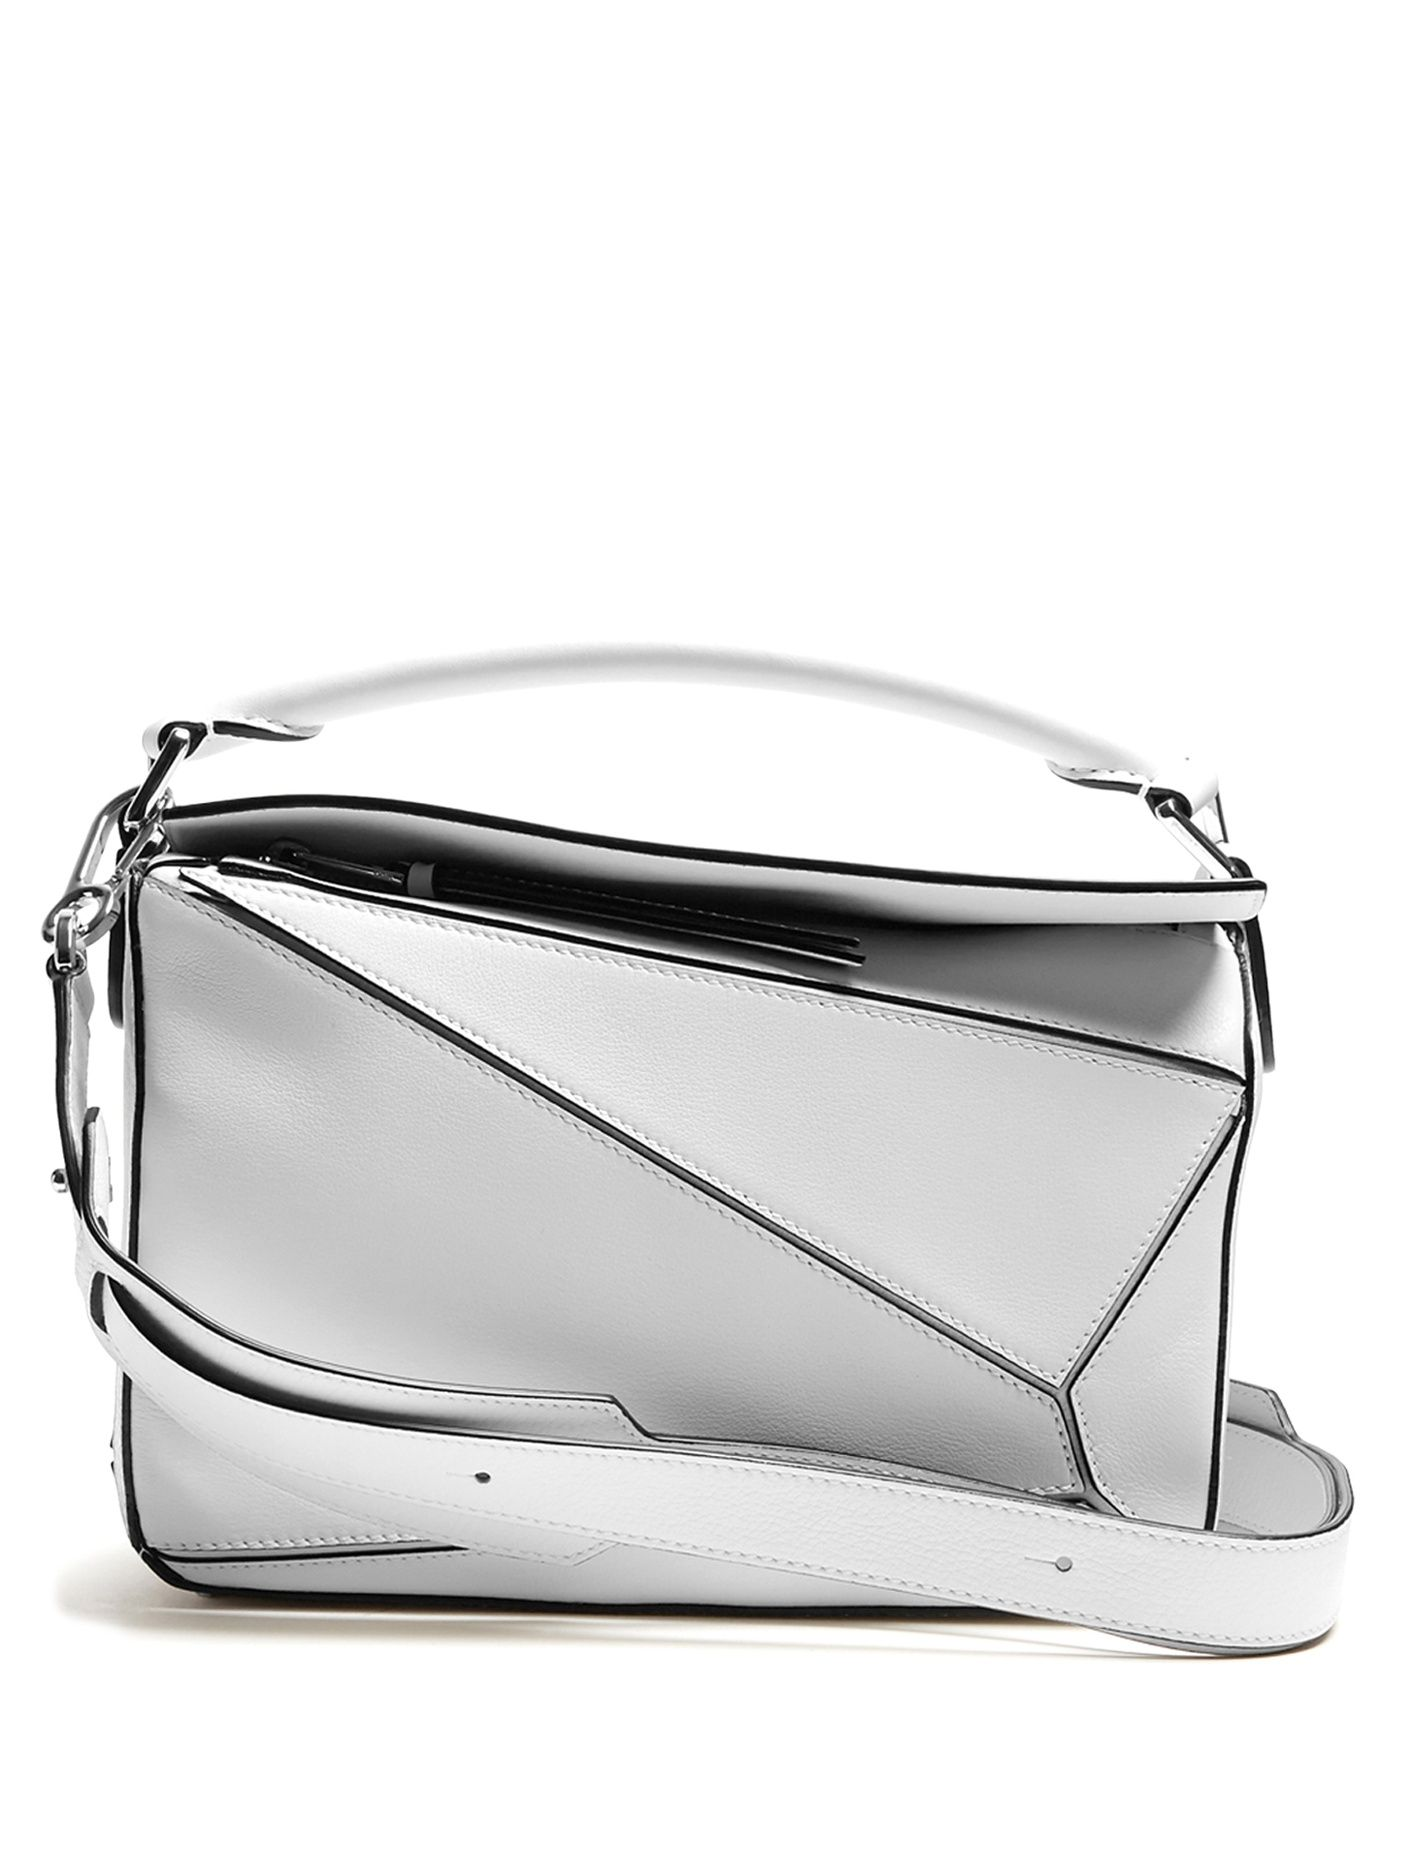 Puzzle small leather cross-body bag | Loewe | MATCHESFASHION.COM UK